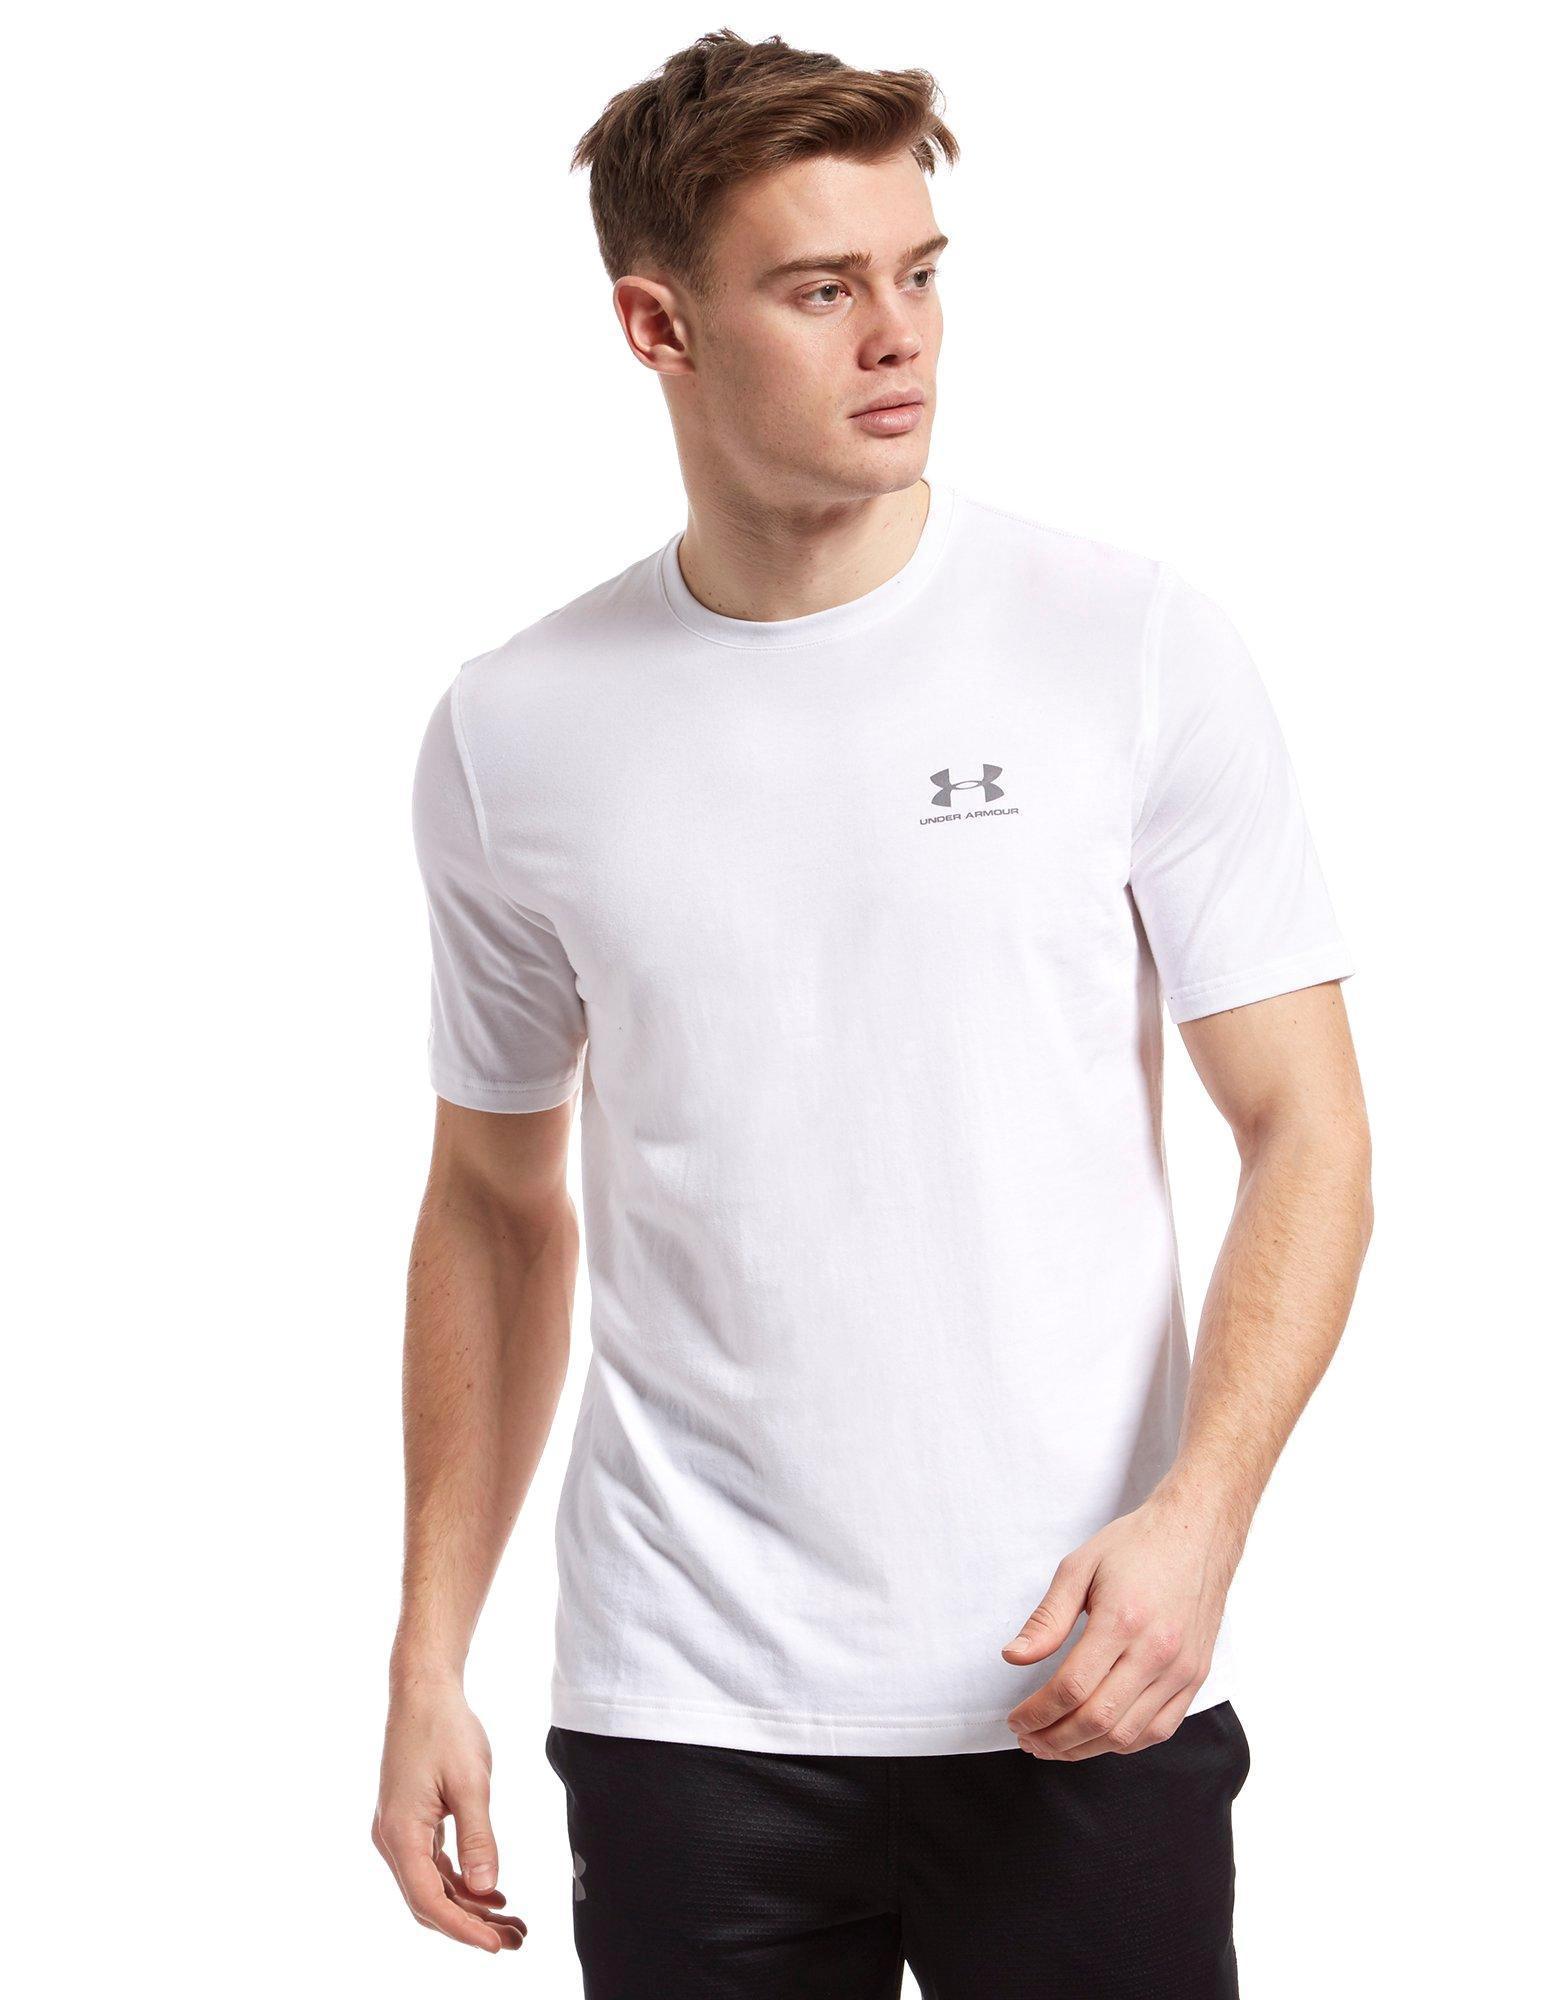 9034bec2 Under Armour Sportstyle Left Chest Logo T-shirt in White for Men - Lyst